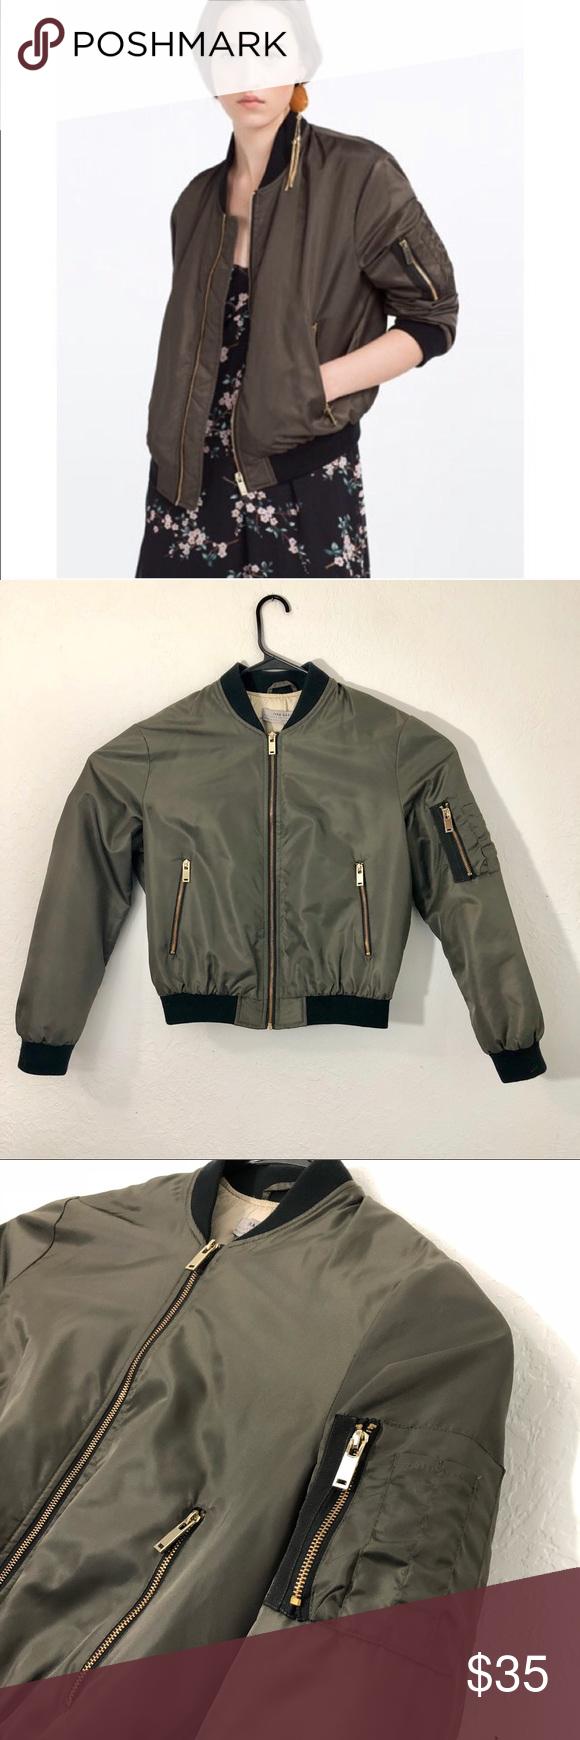 Zara Basic Outerwear Dark Green Bomber Jacket S Zara Green Bomber Jacket Zara Basics [ 1740 x 580 Pixel ]